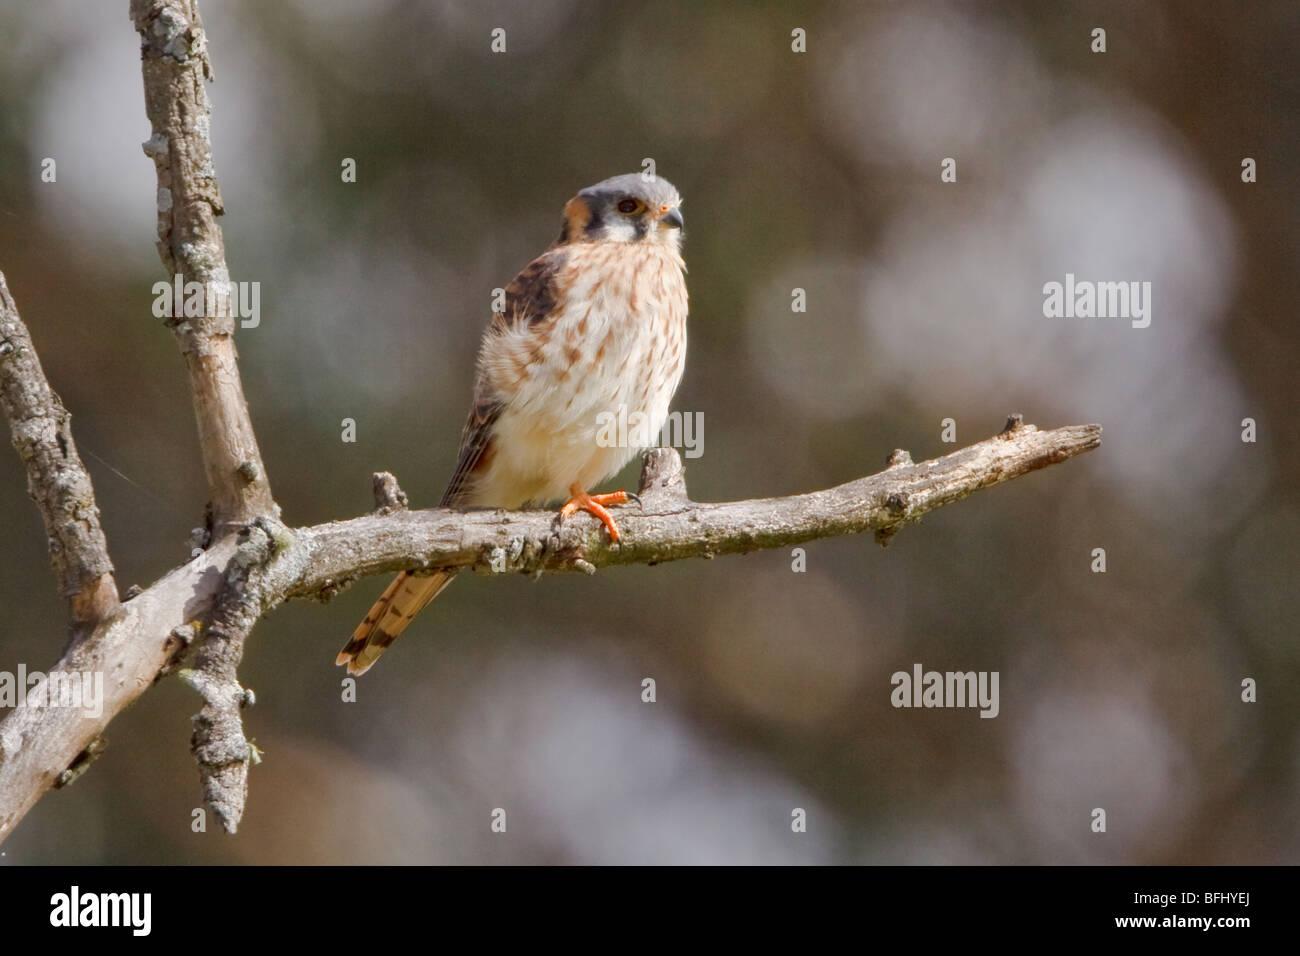 American Kestrel (Falco sparverius) perched on a branch in Cuenca in southern Ecuador. - Stock Image